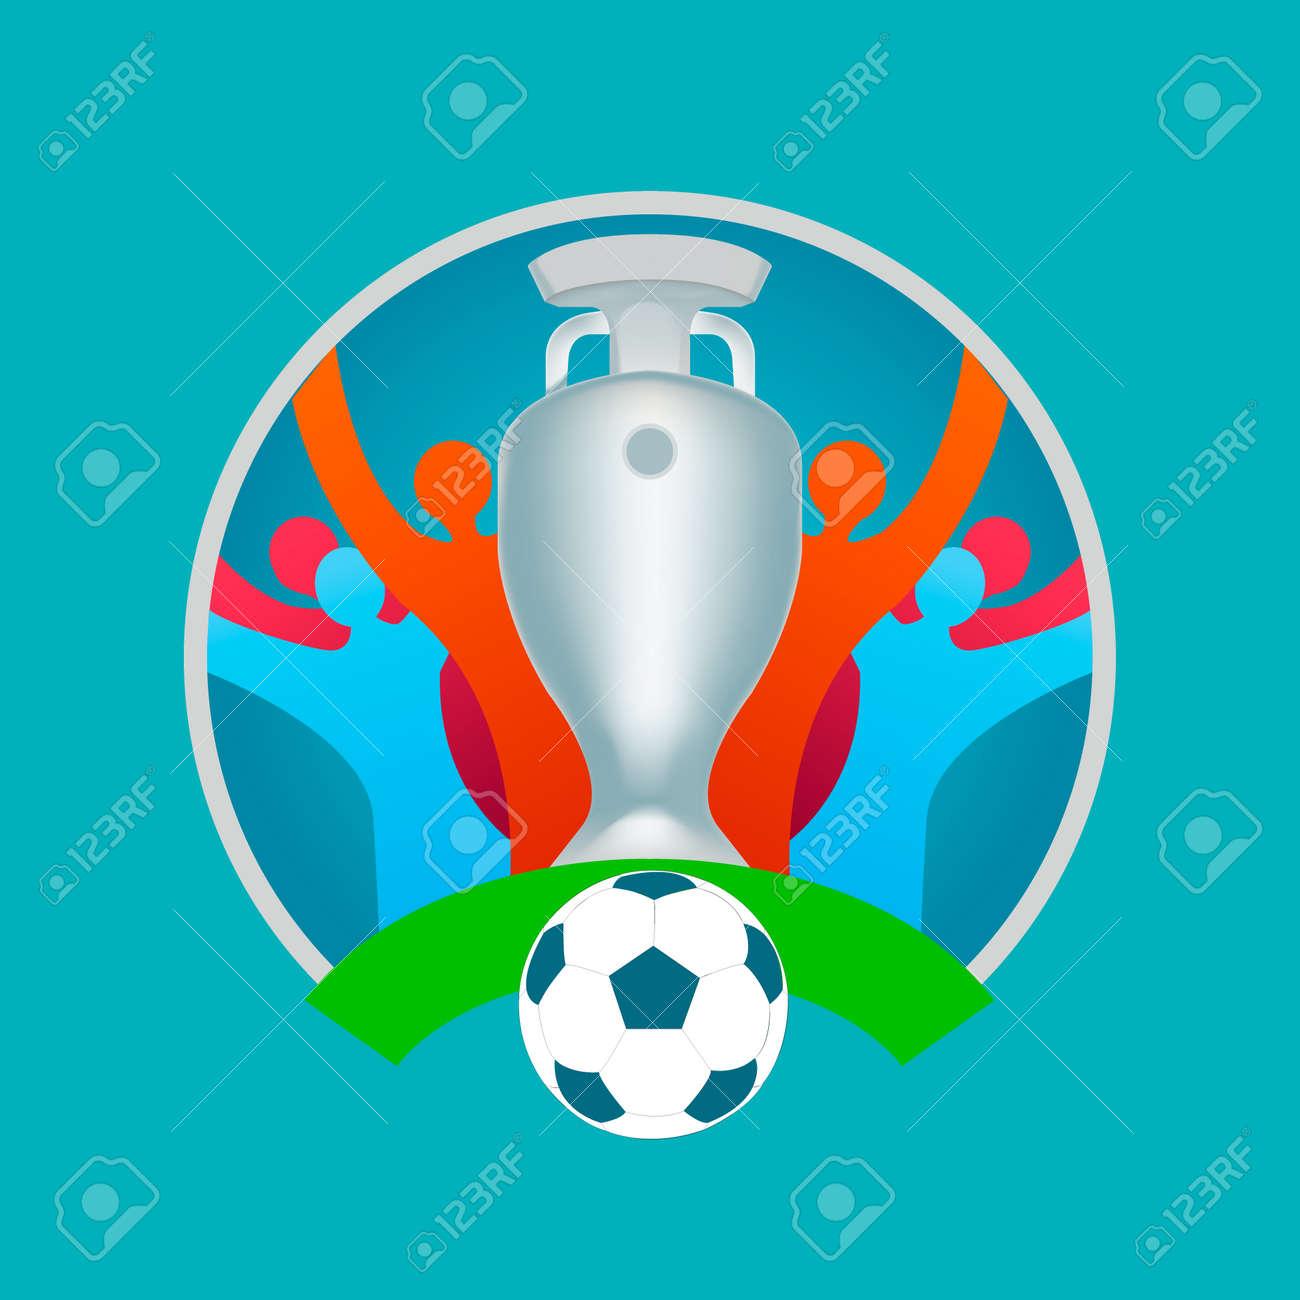 football match Sports concept tournament background. - 170287704